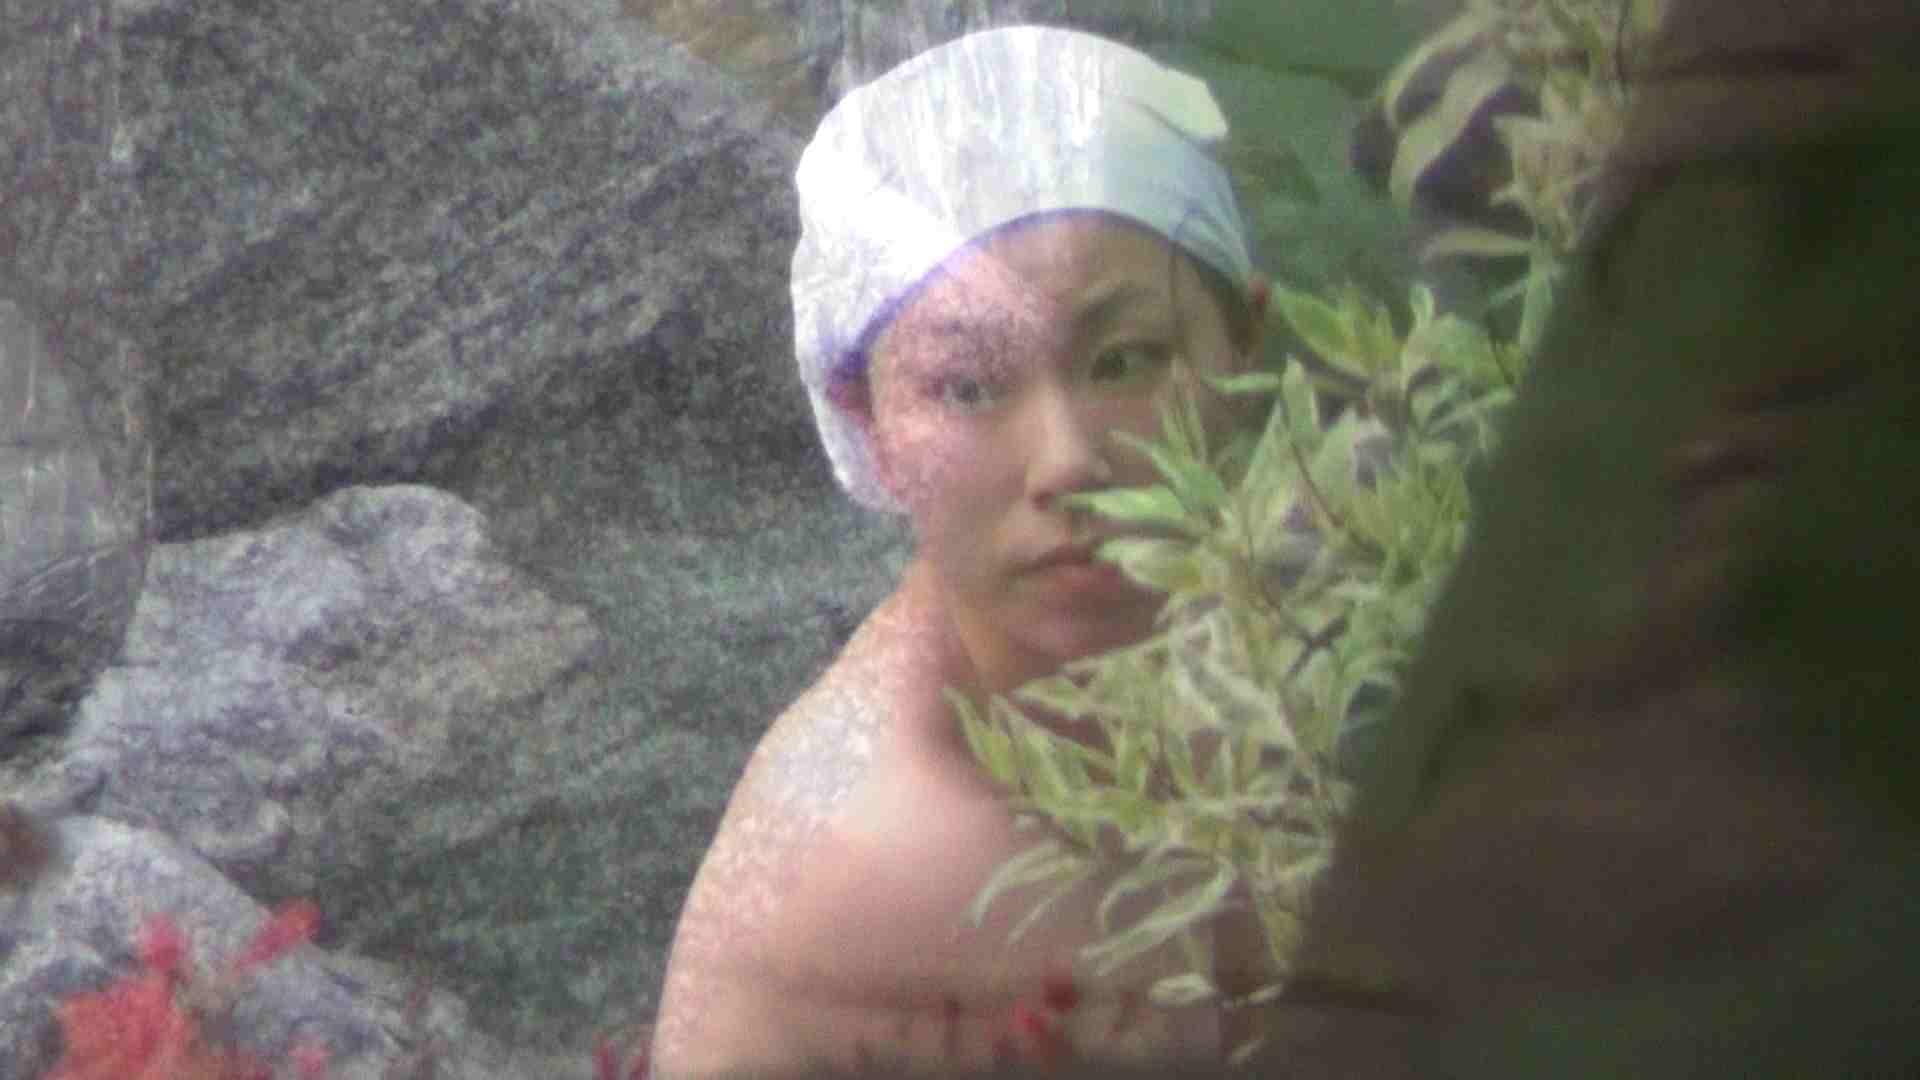 Aquaな露天風呂Vol.254 OLセックス | 露天  53画像 16